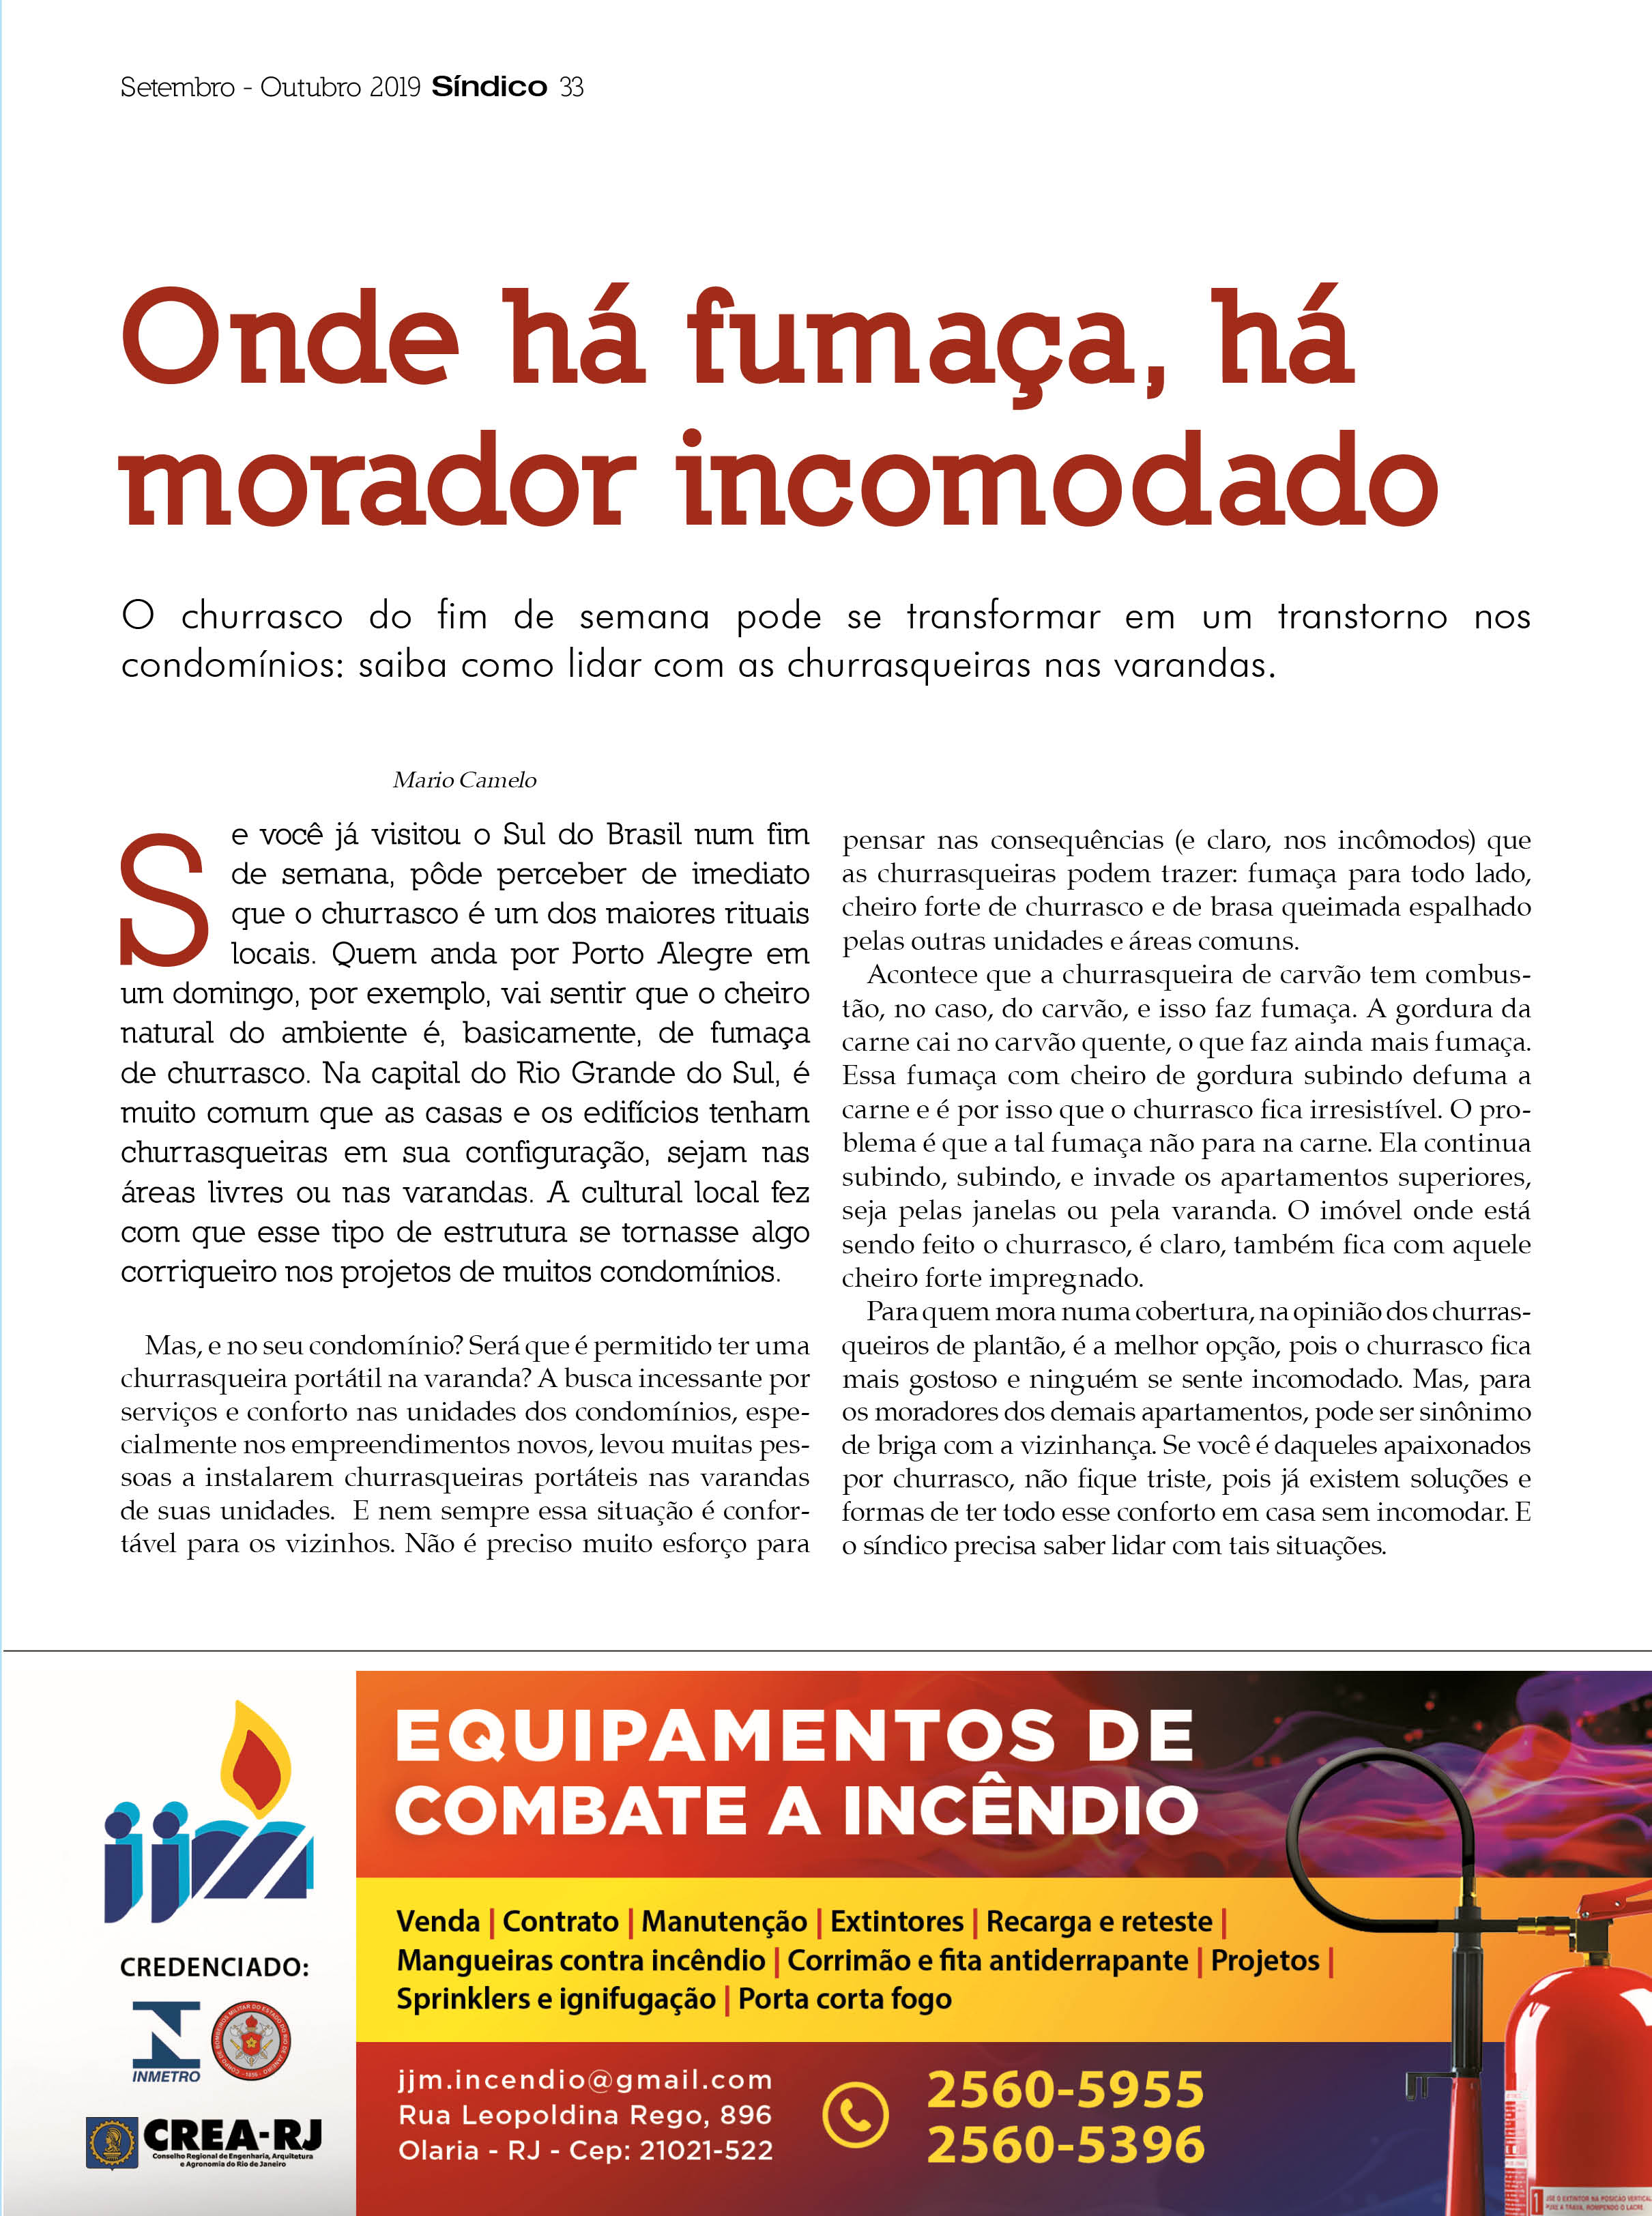 Revista Síndico_ed 246_31